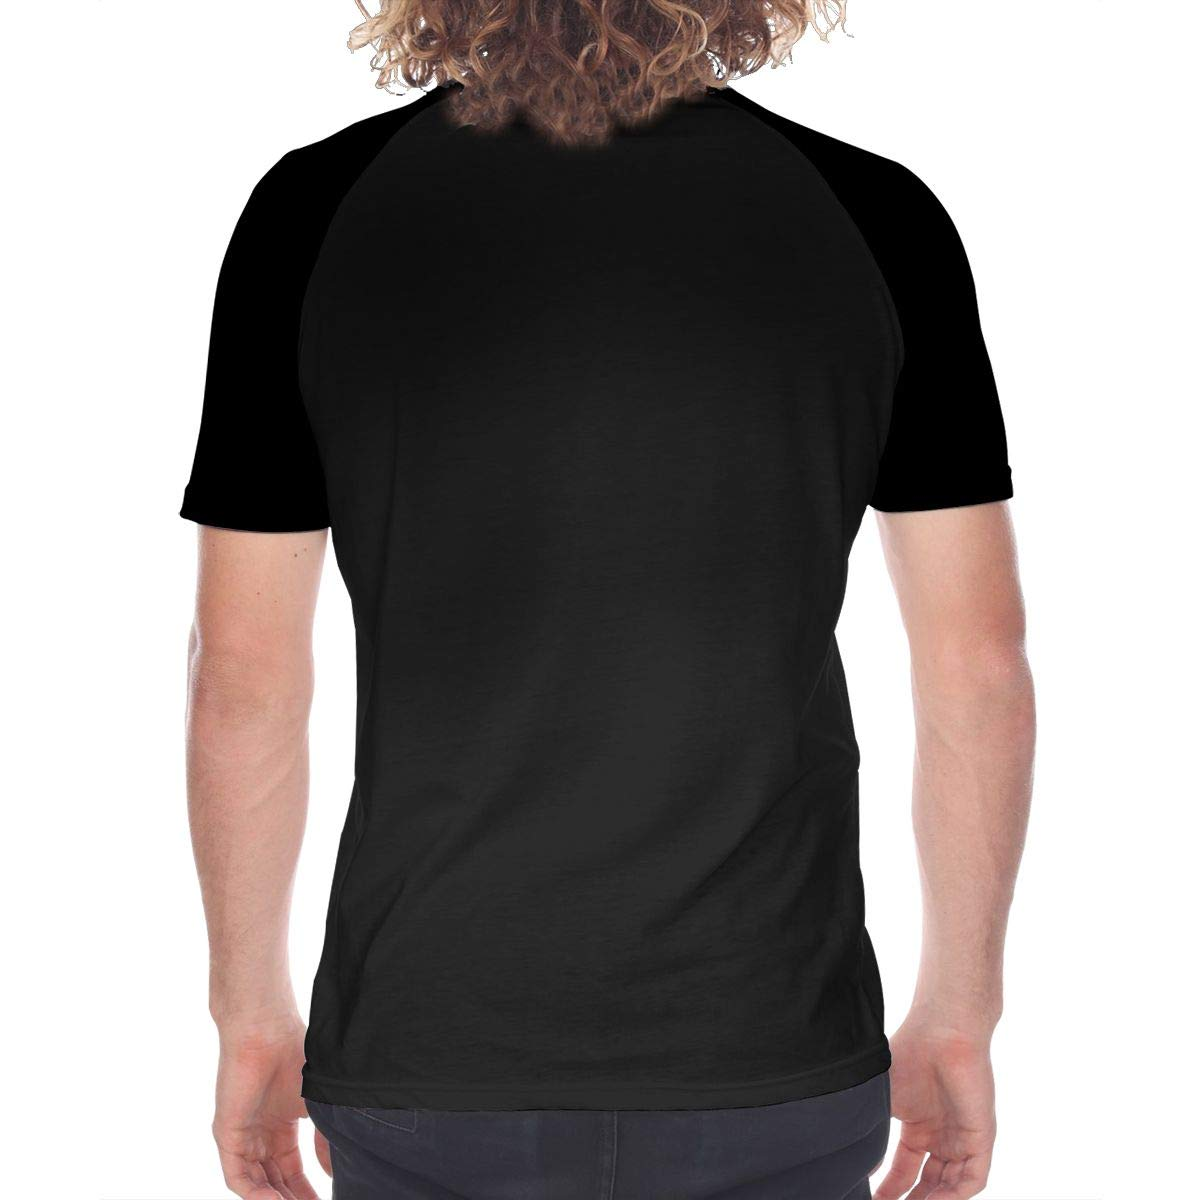 FwadGacx LazarBeam Men Youth Stylish Short Sleeves Full Size Printed Baseball Tee Gift